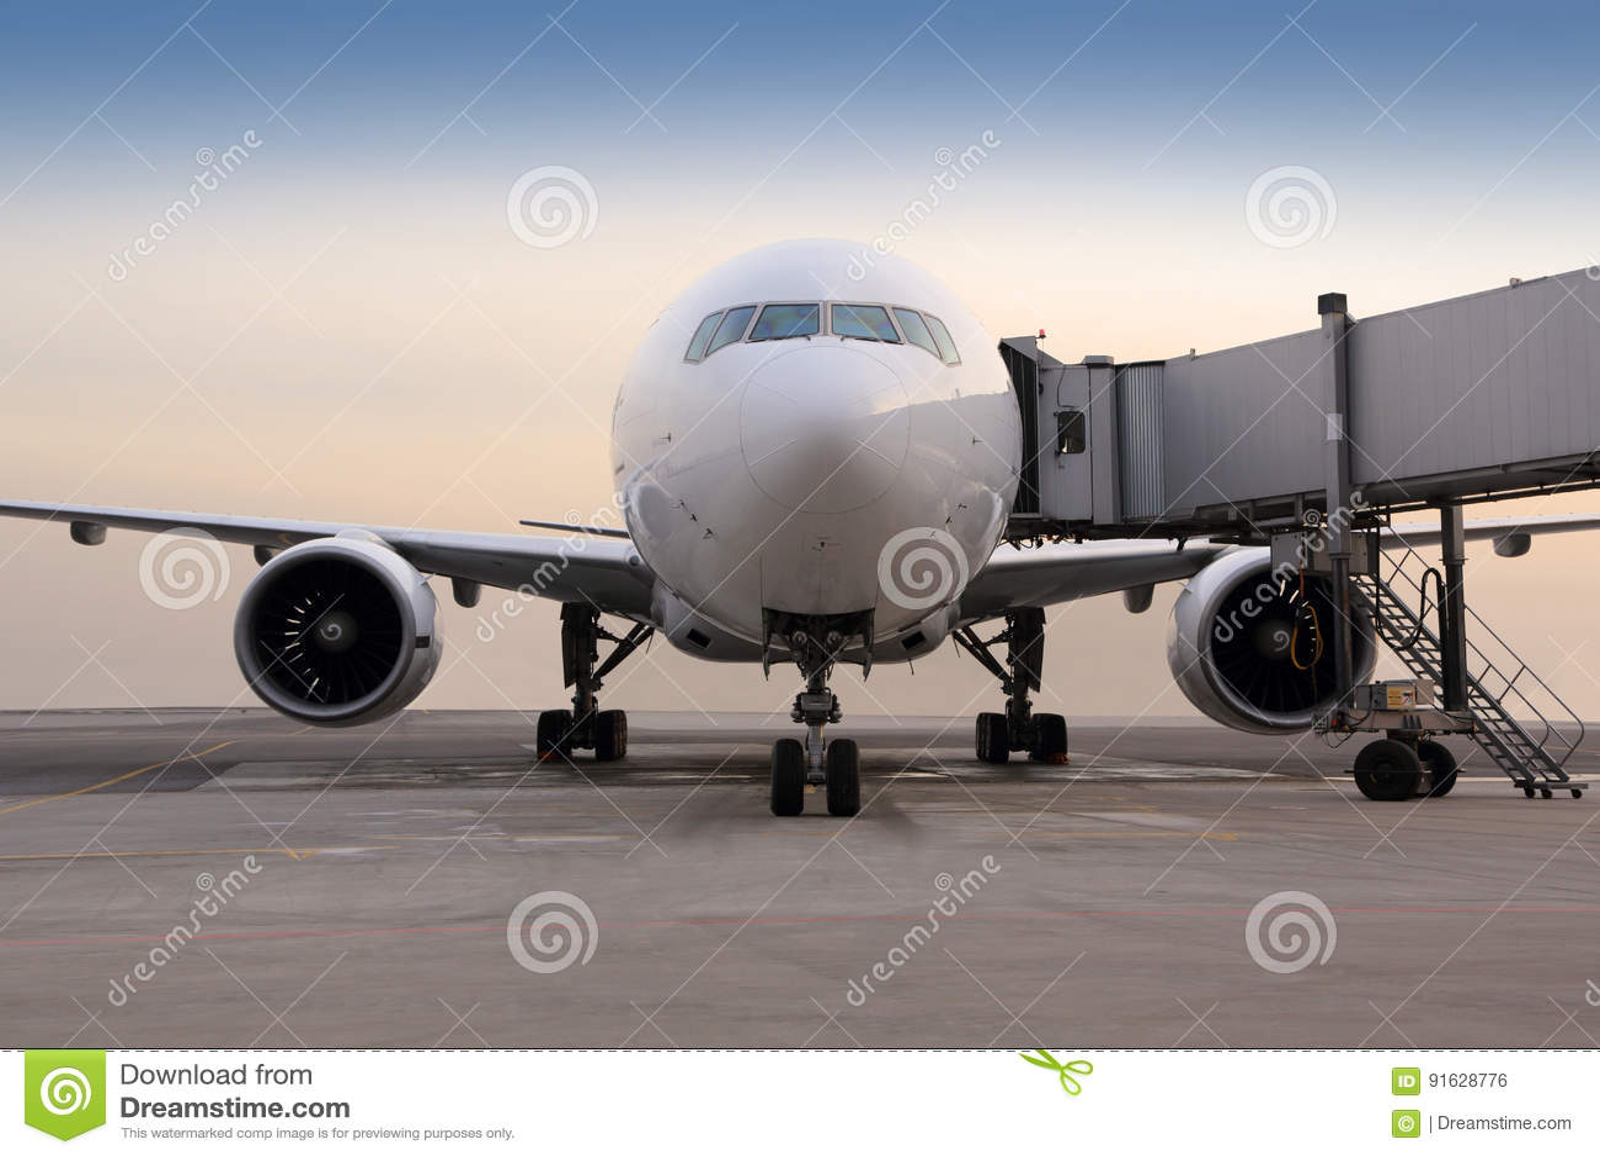 Civil passenger airplane standing near the gate